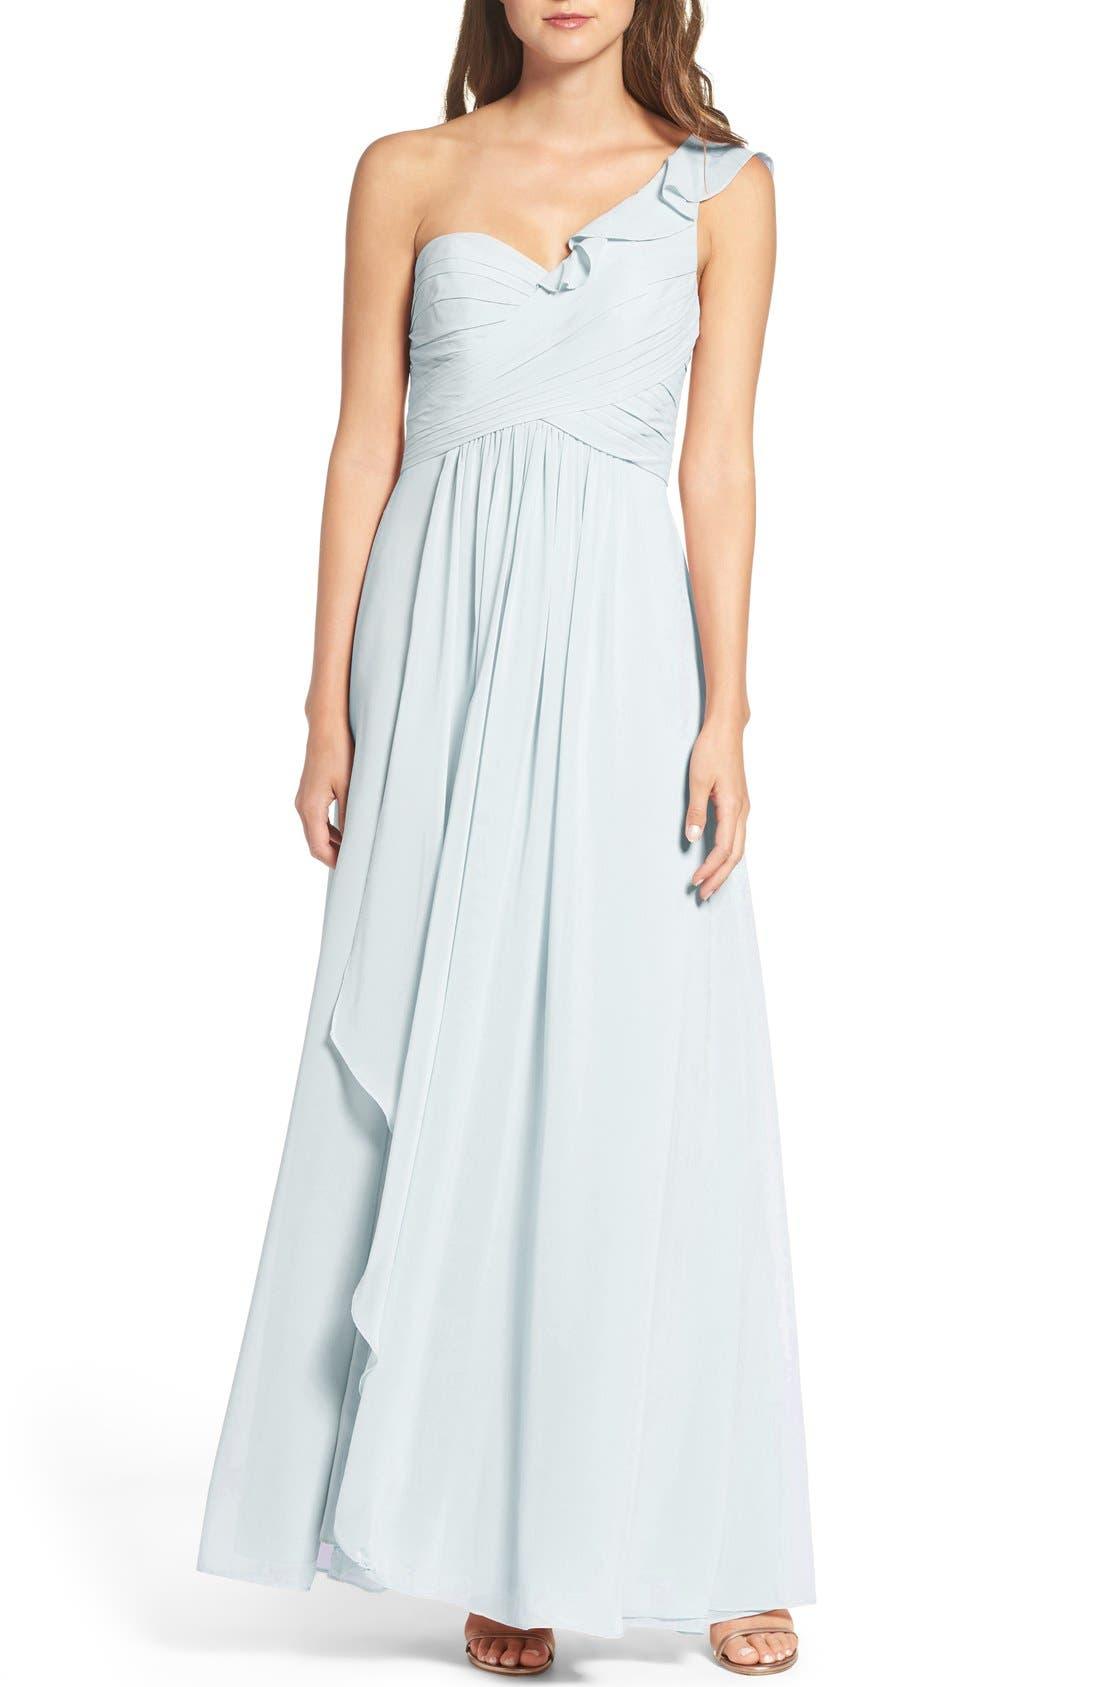 Main Image - WTOO One-Shoulder Chiffon Dress